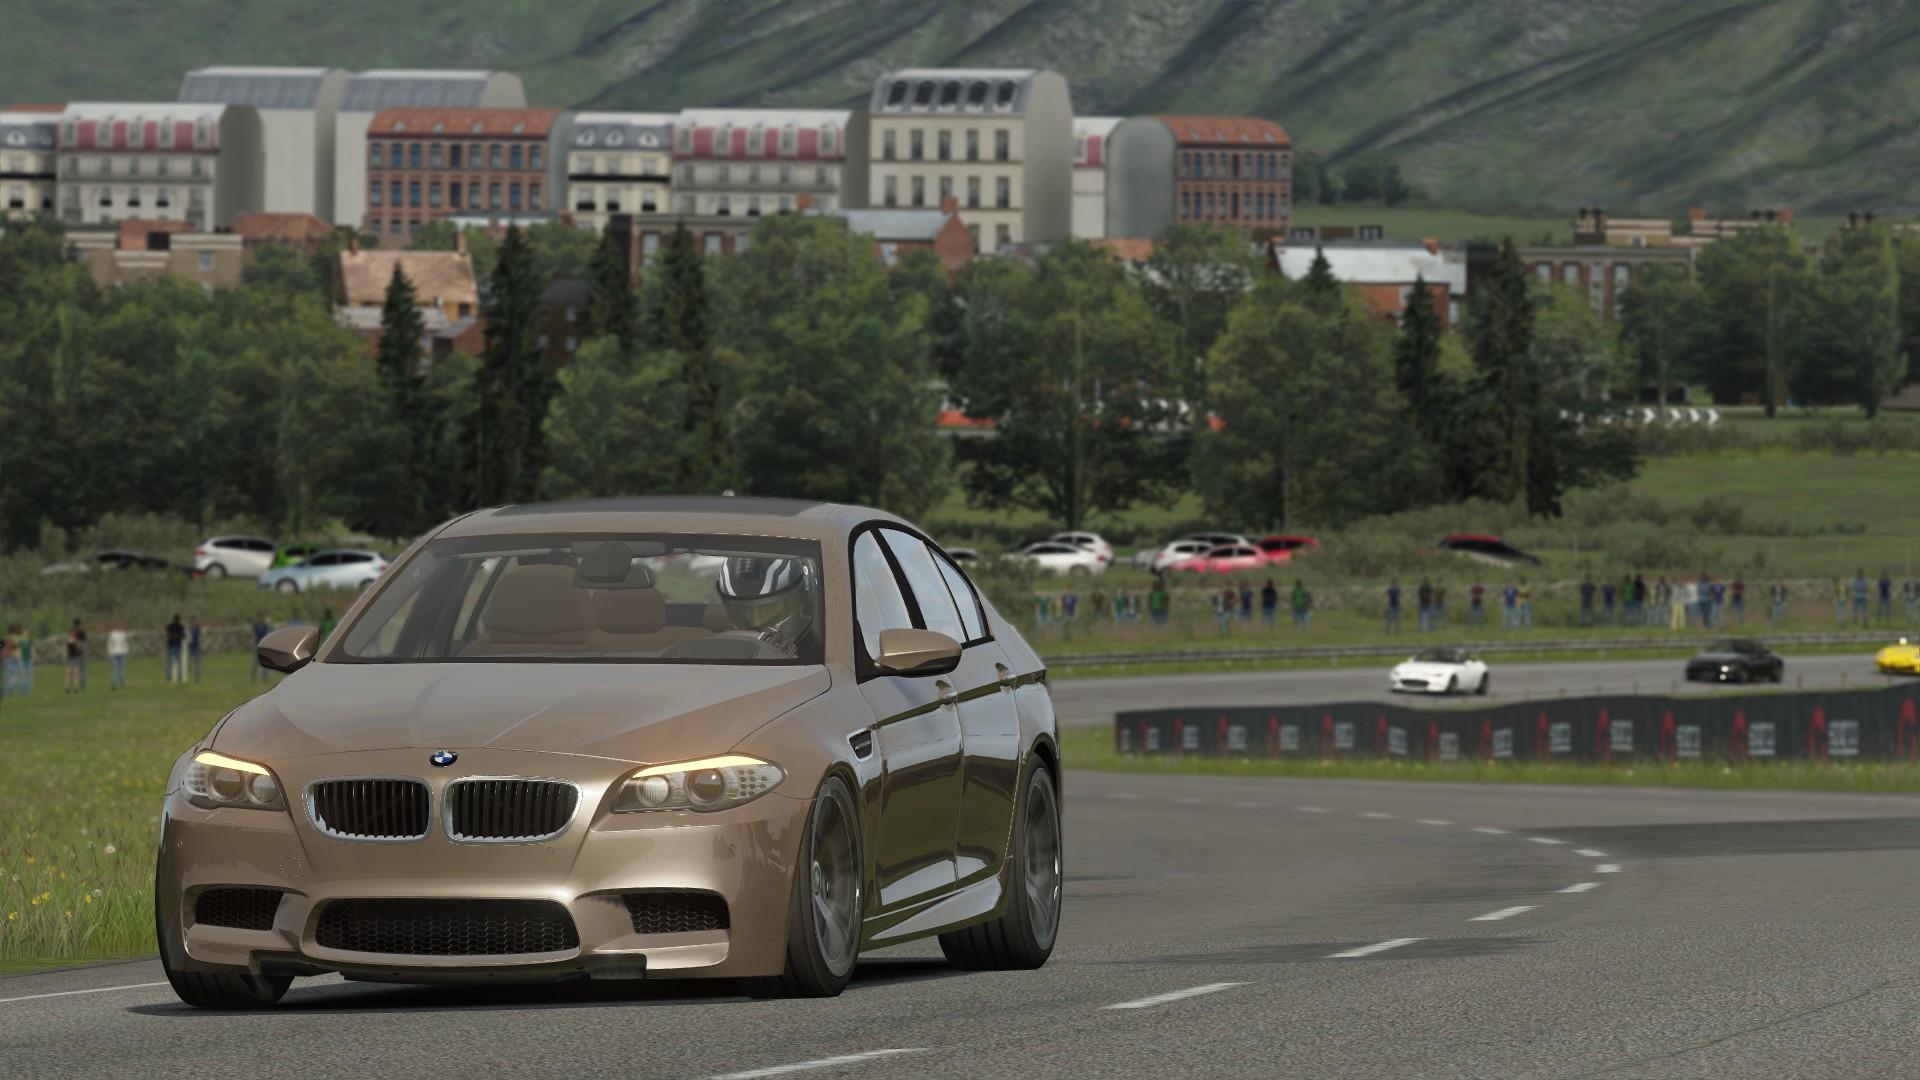 BMW M5 F10 street racing at Highlands.jpg